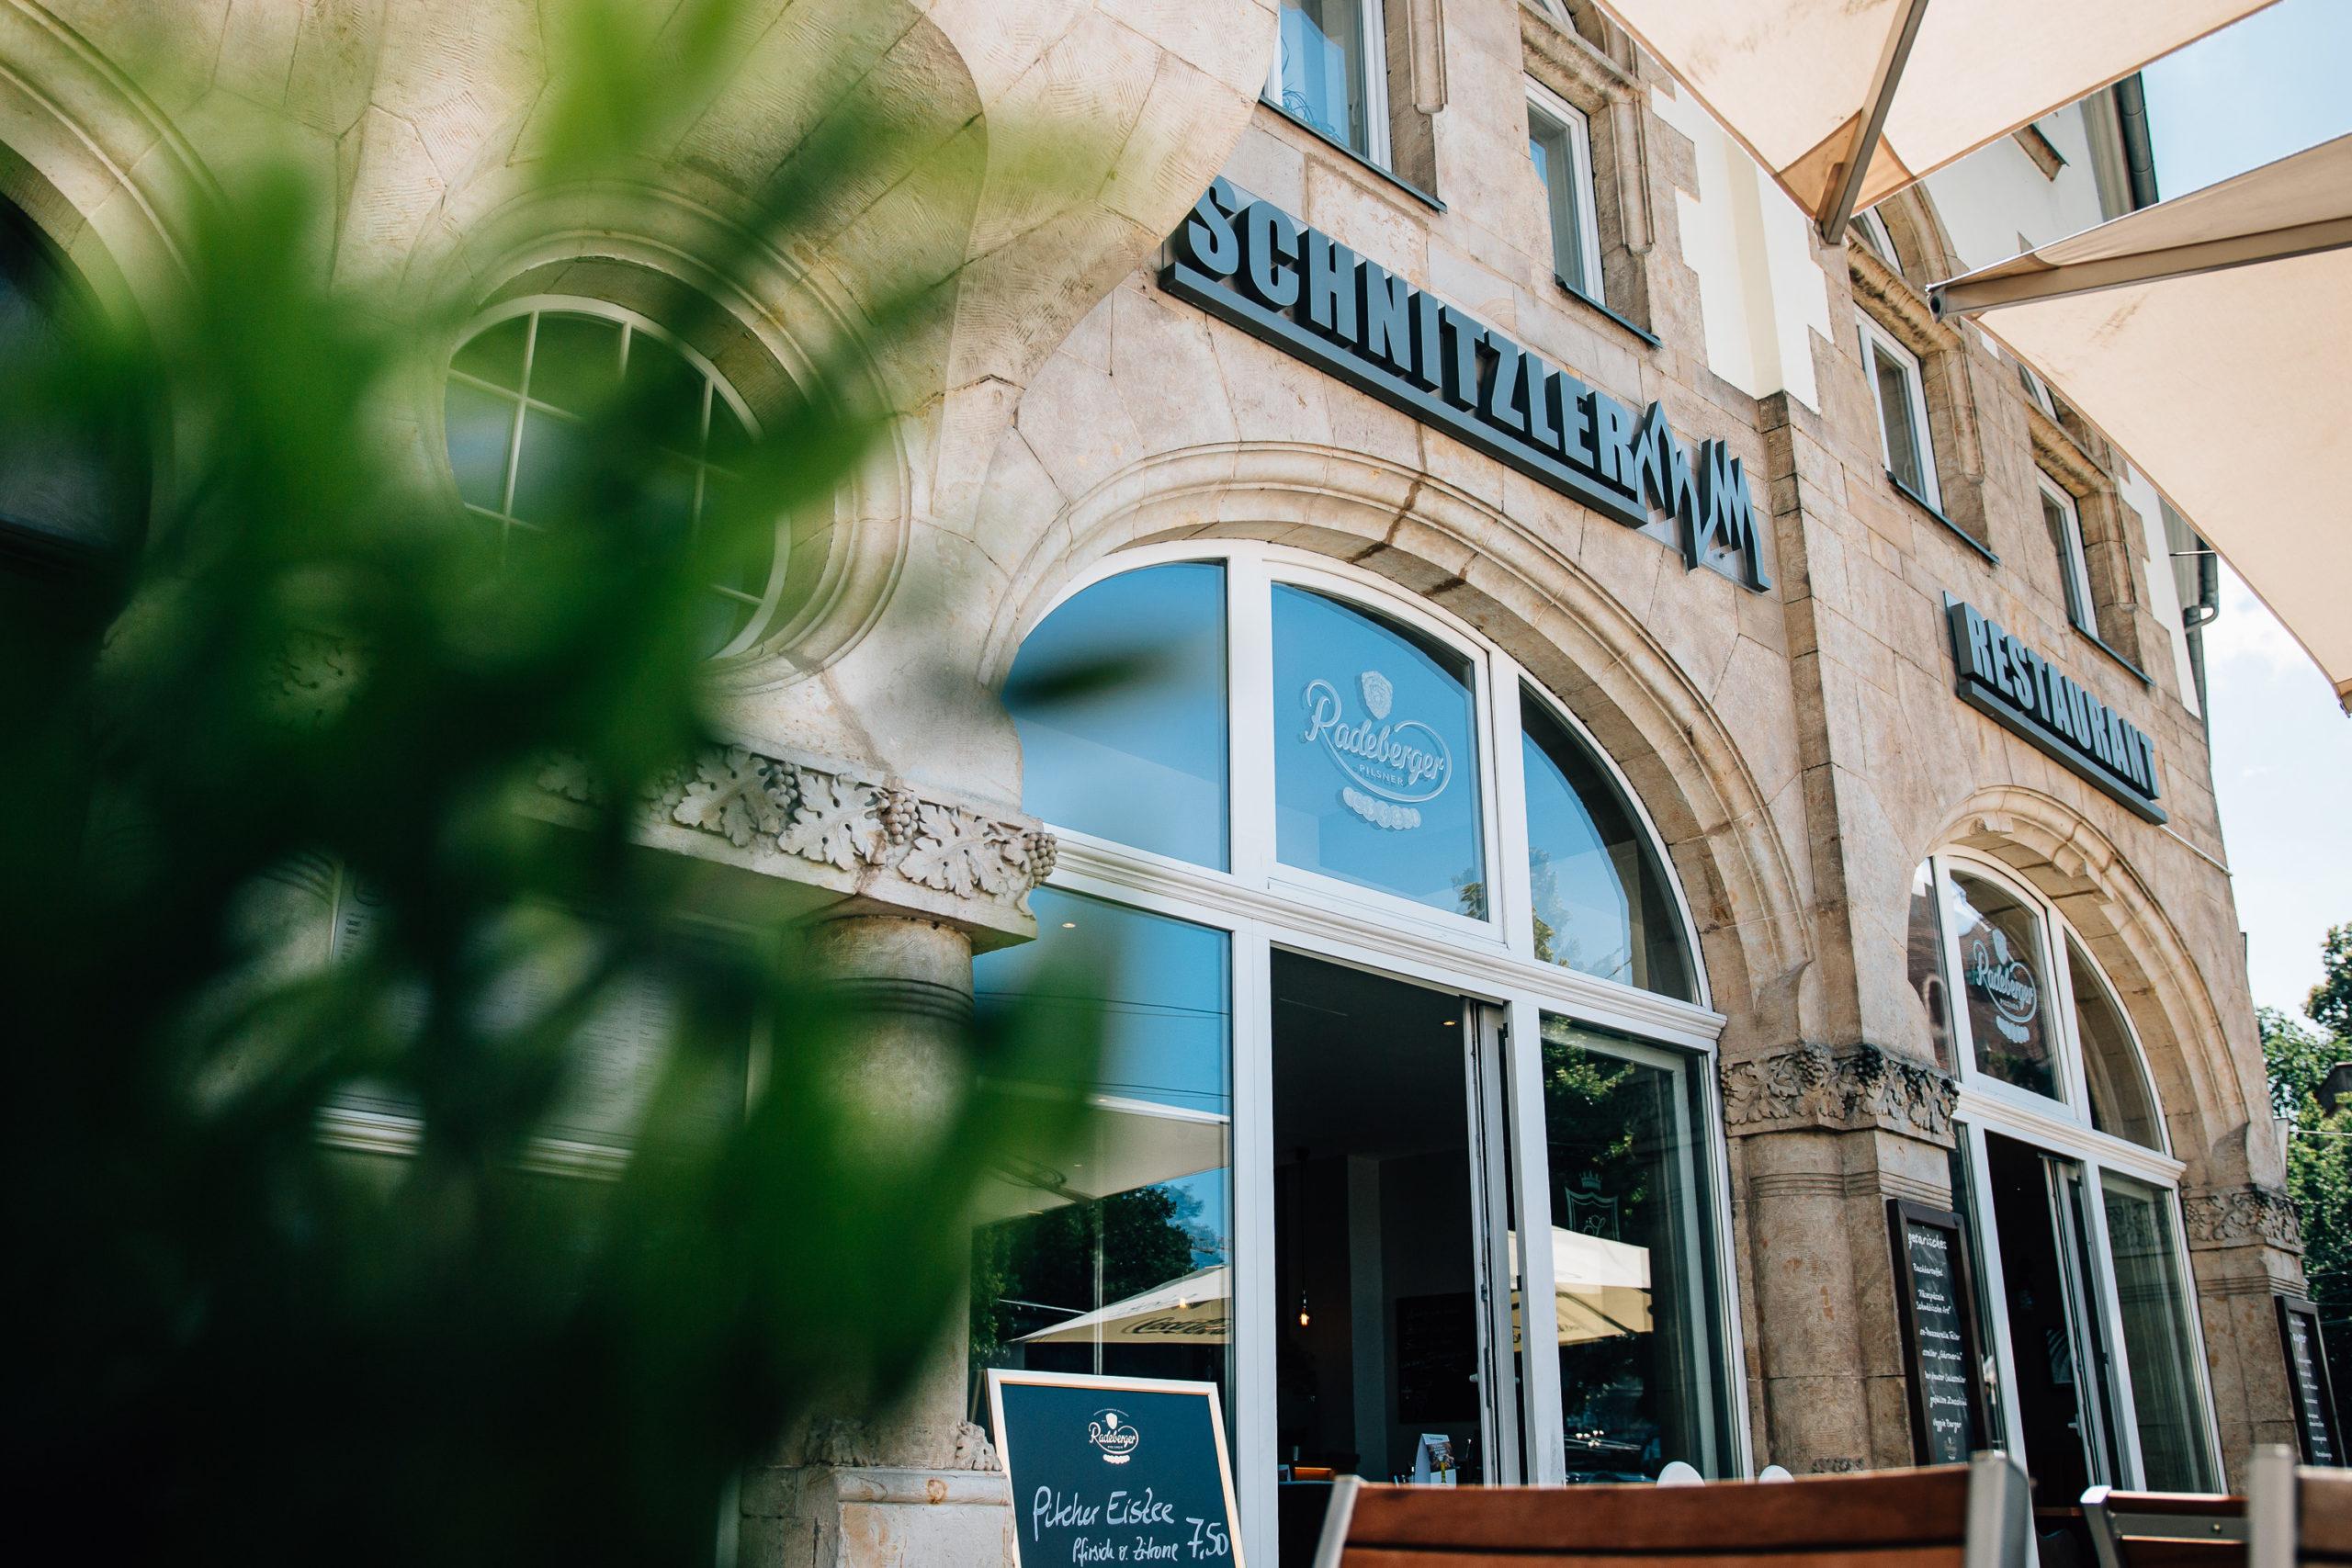 Schnitzler Restaurant Erfurt